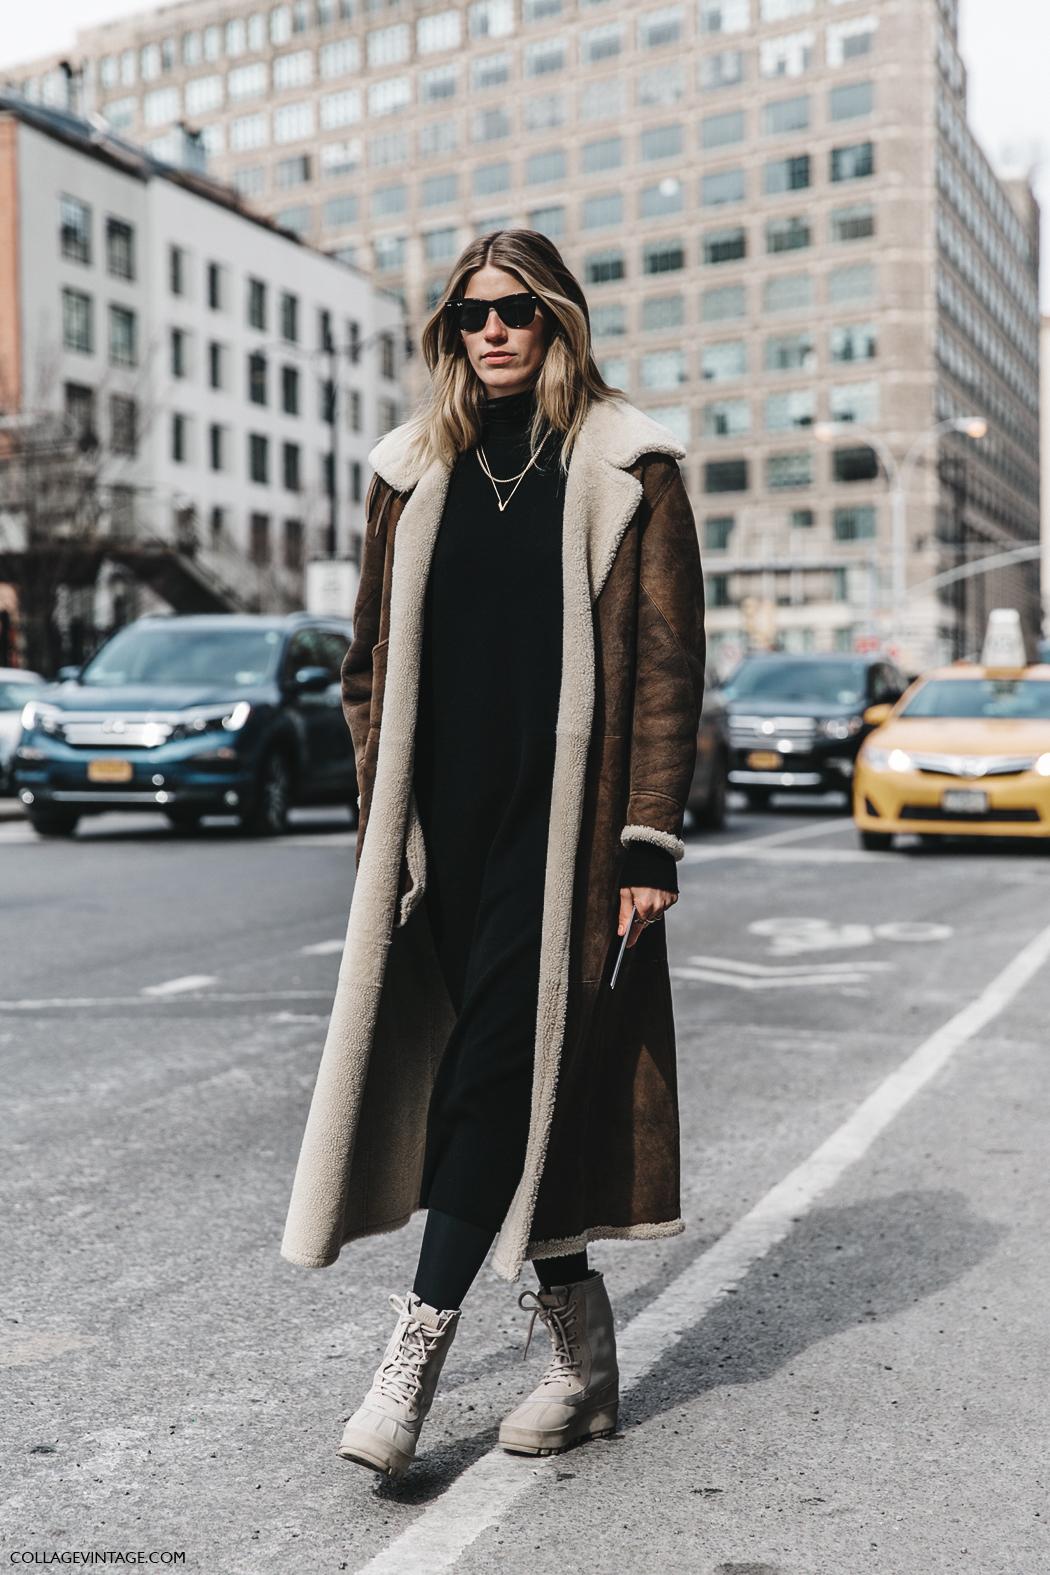 NYFW-New_York_Fashion_Week-Fall_Winter-17-Street_Style-Veronika_Heilbrunner-Suede_Coat-Black_look-2